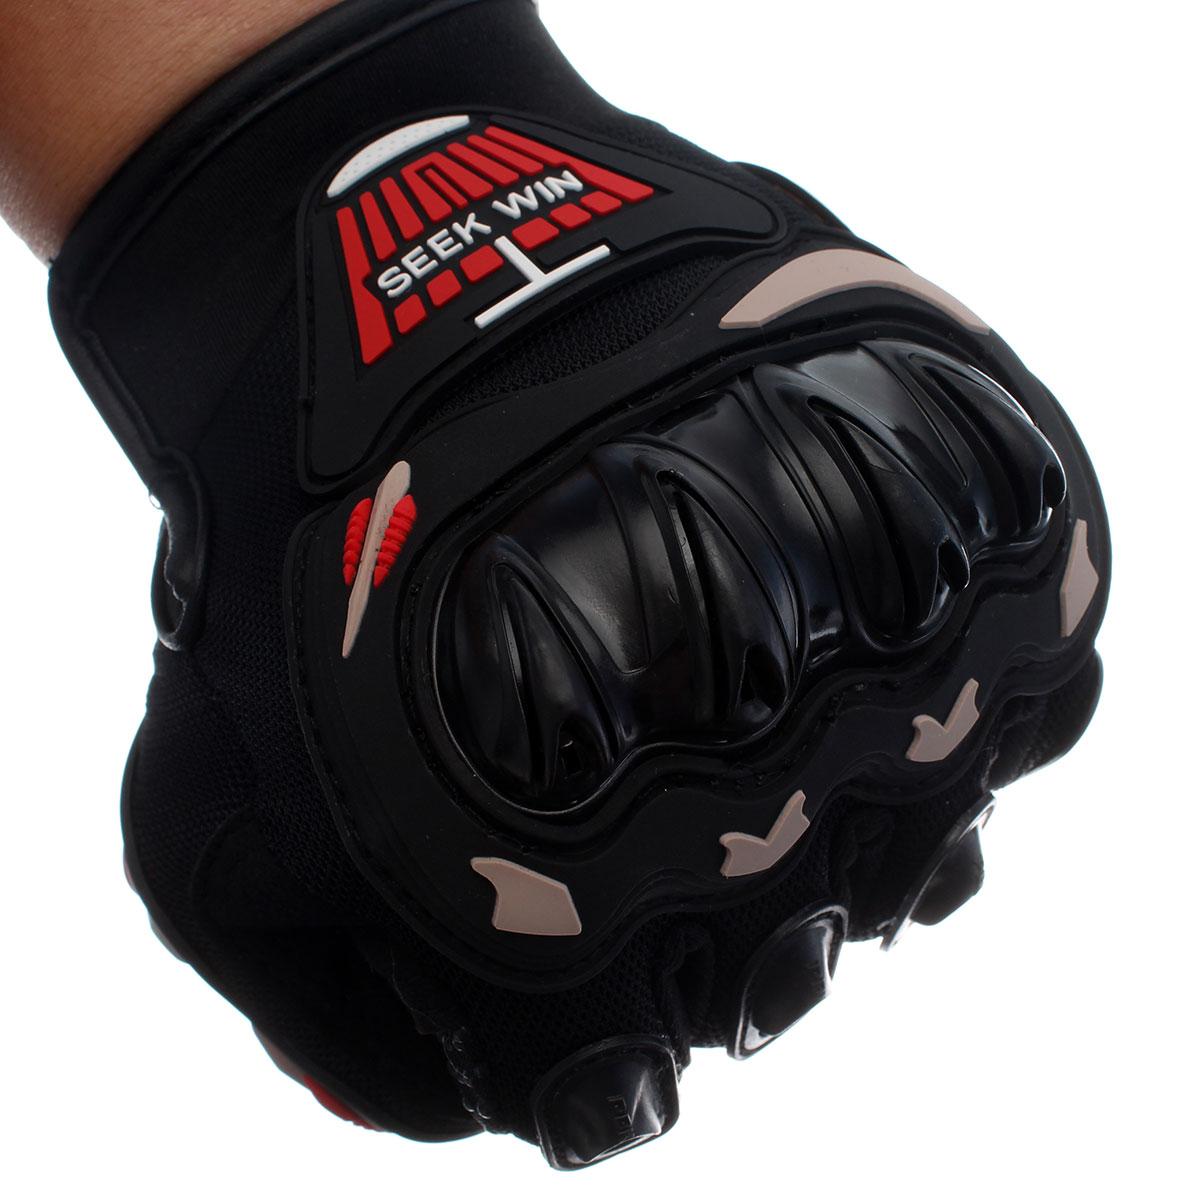 Motorcycle gloves singapore - Image